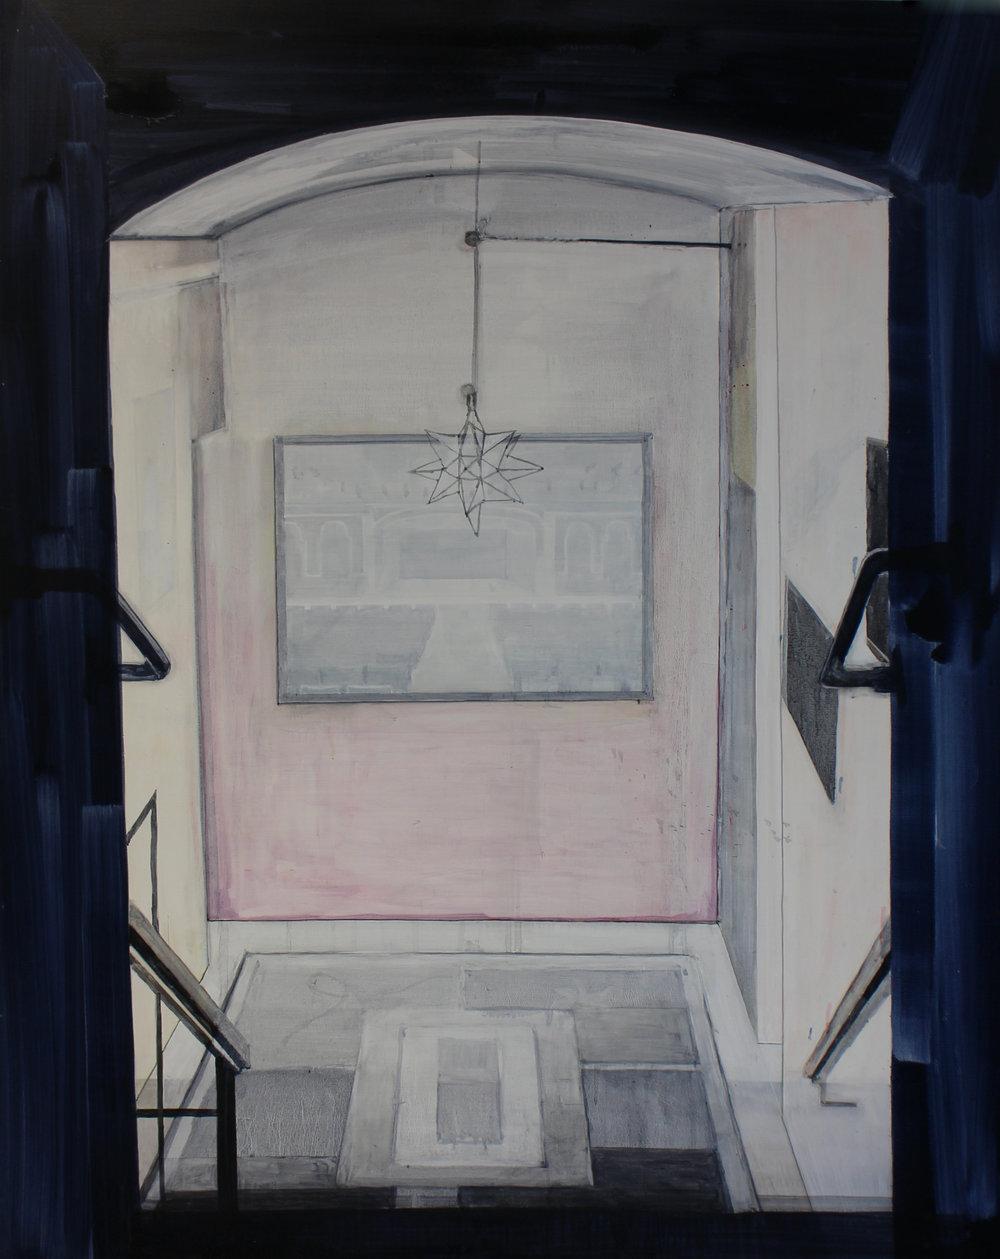 Daniel Nel  Foyer  Oil on canvas  160 x 120.5 cm